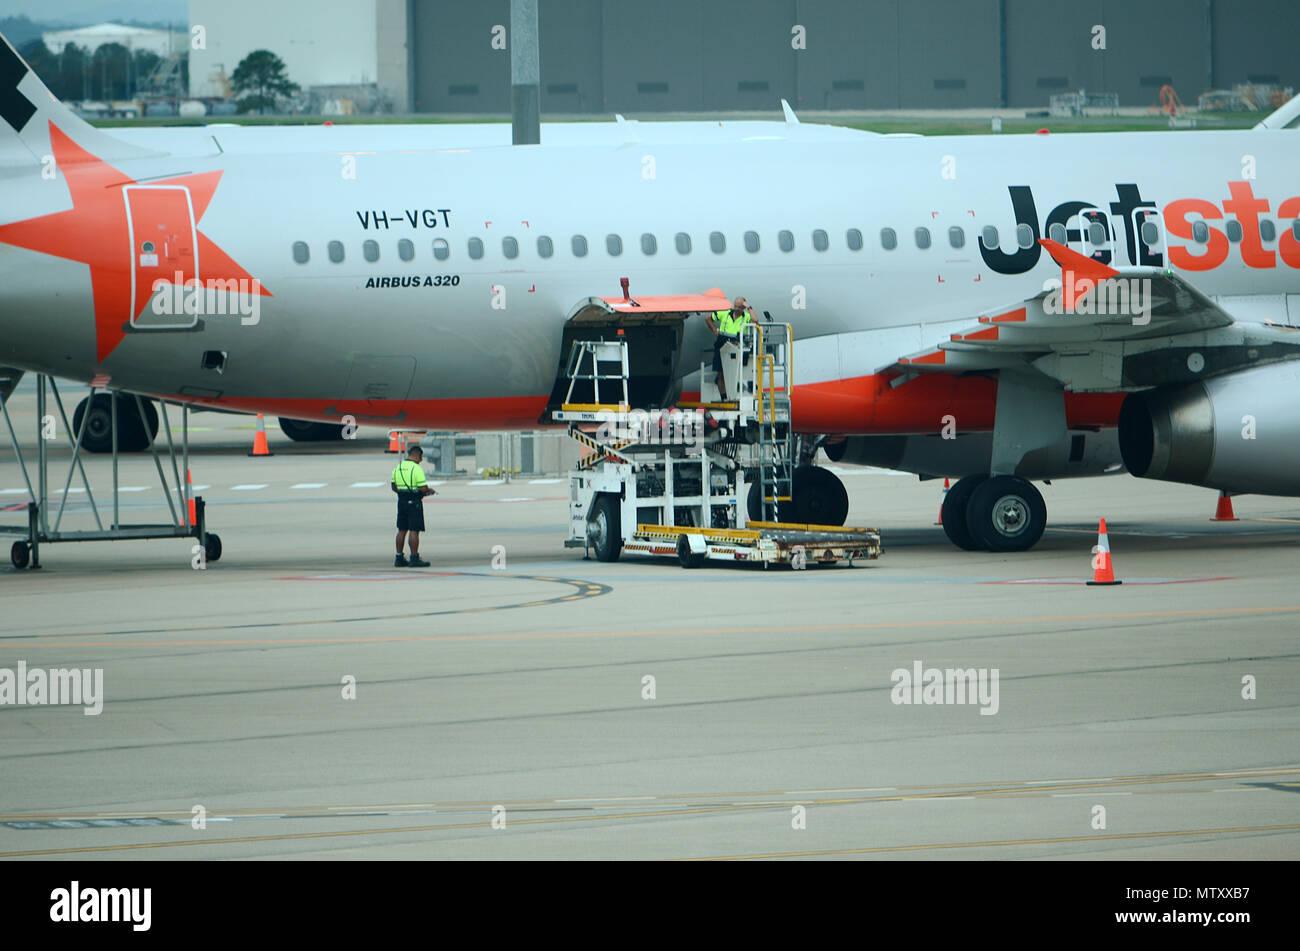 passenger jet at airport - Stock Image